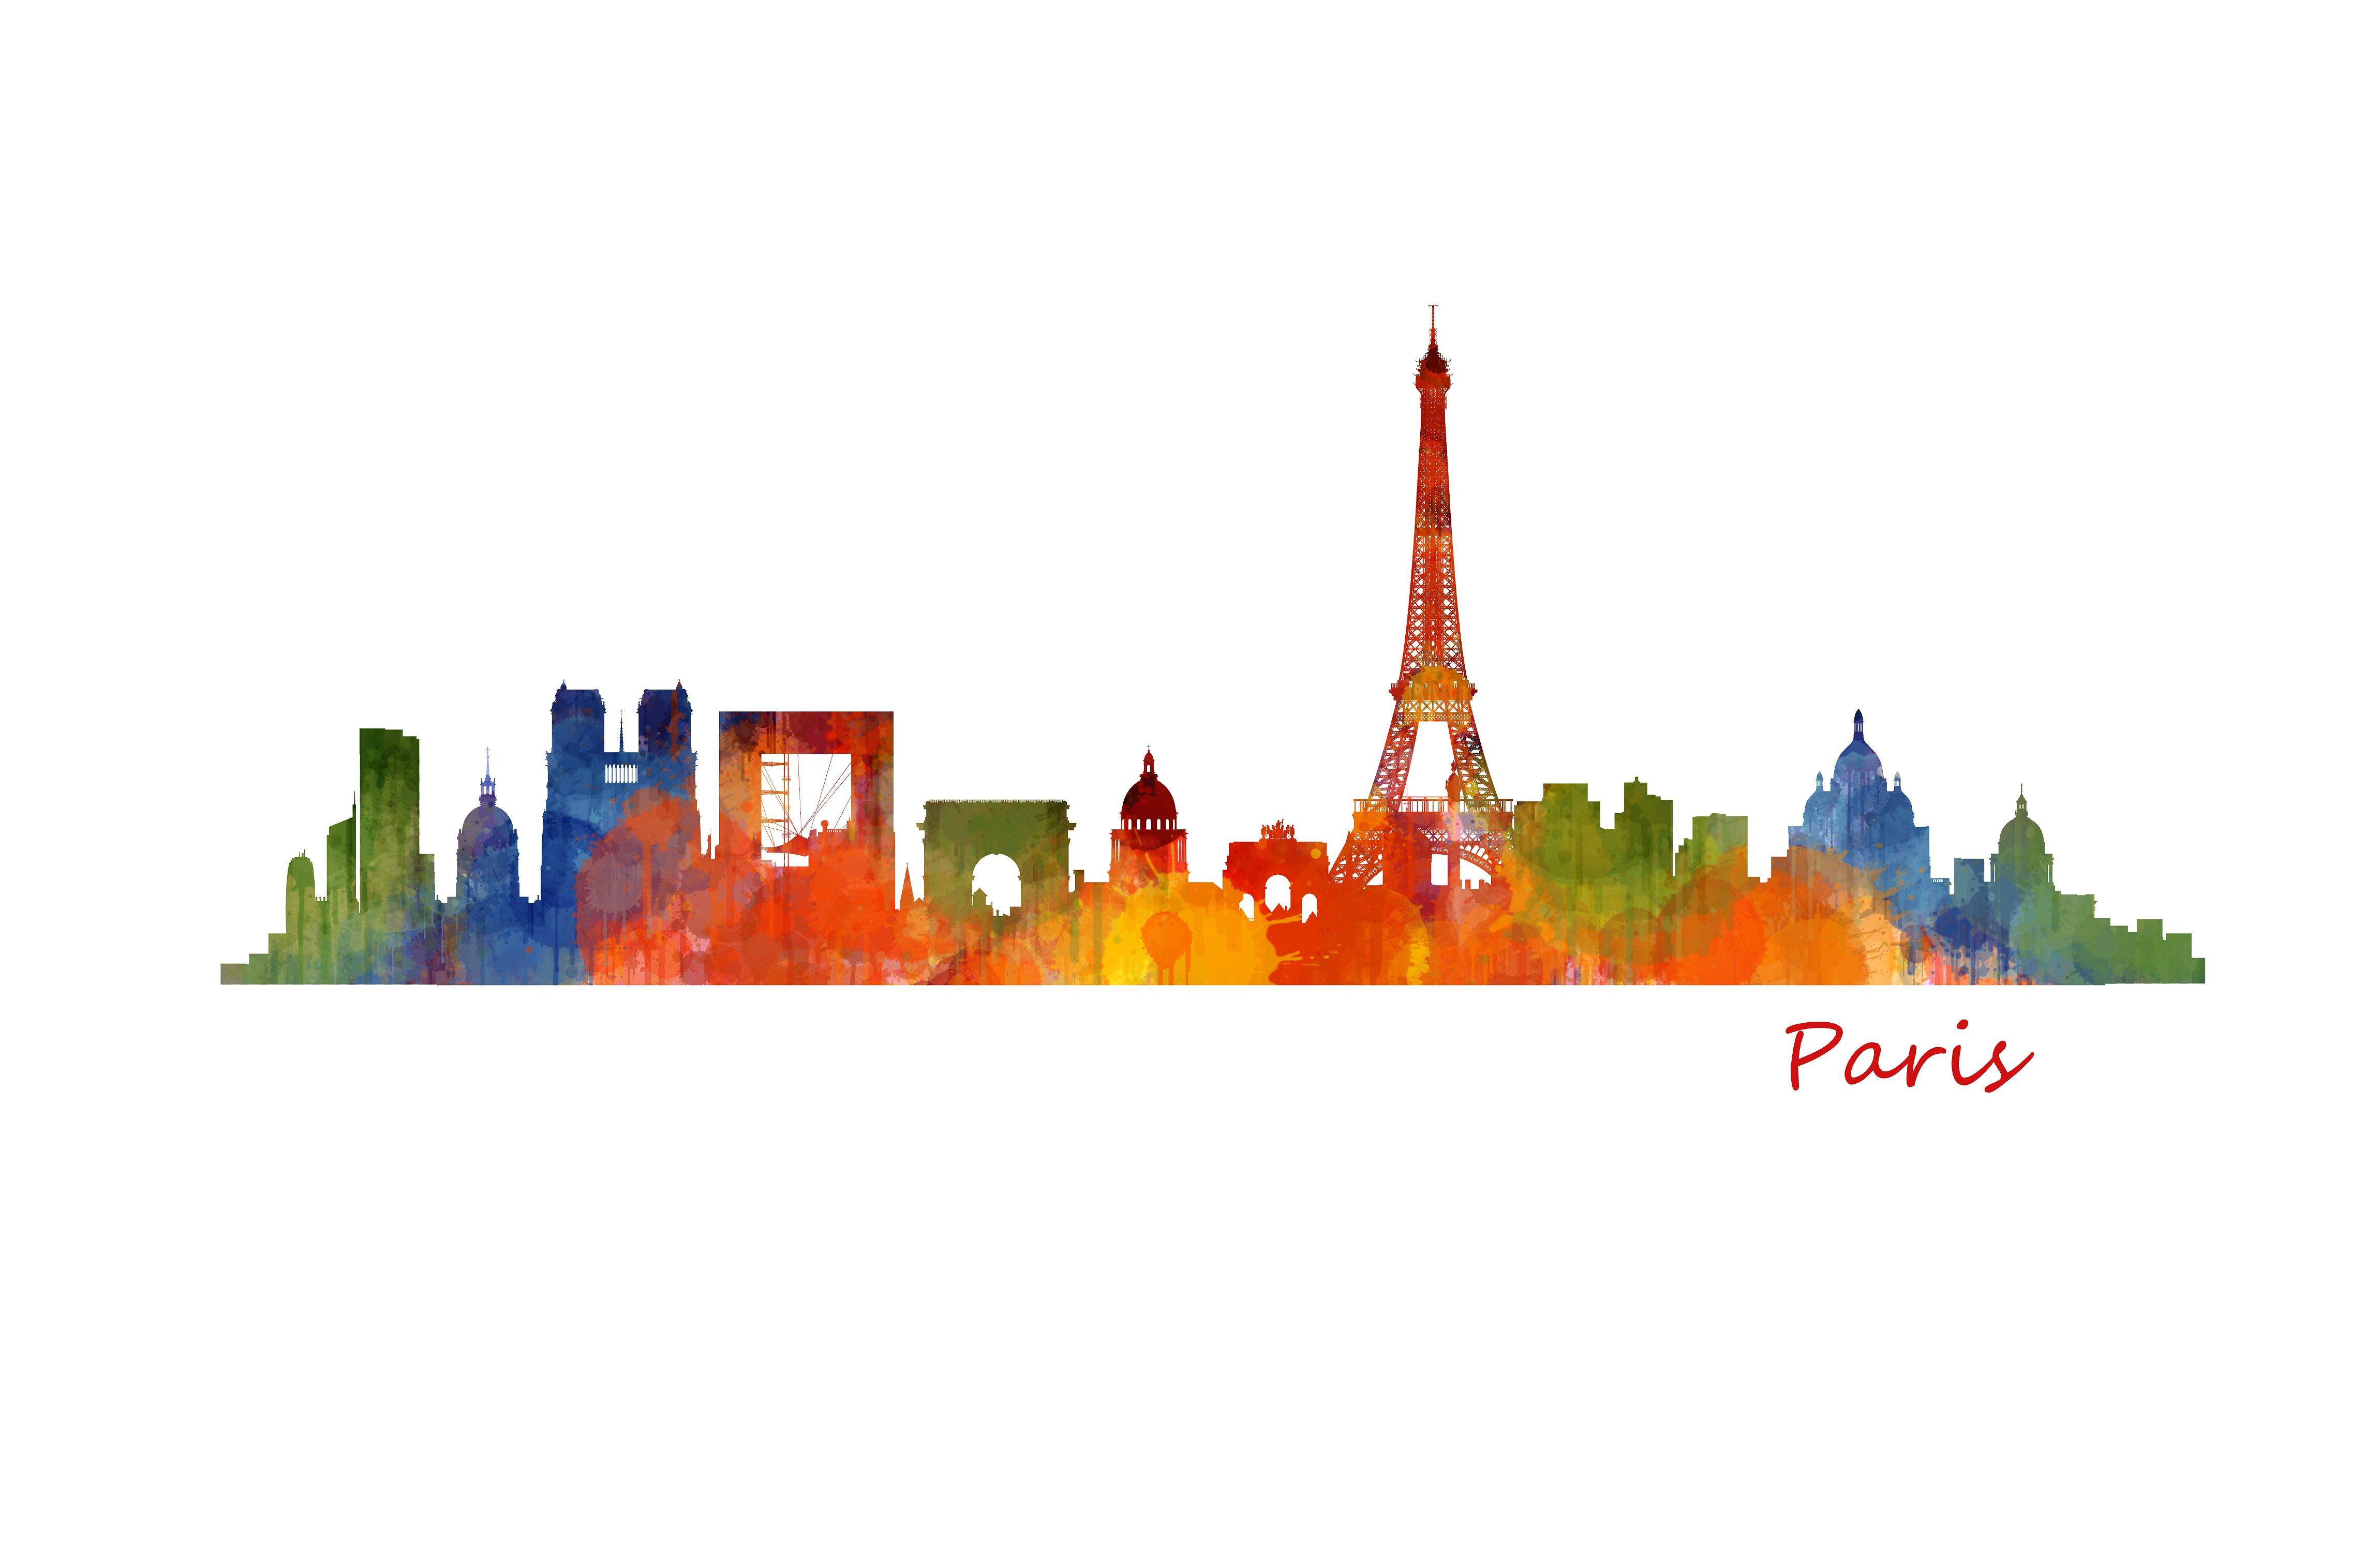 Paris Cityscape Skyline ~ Illustrations ~ Creative Market